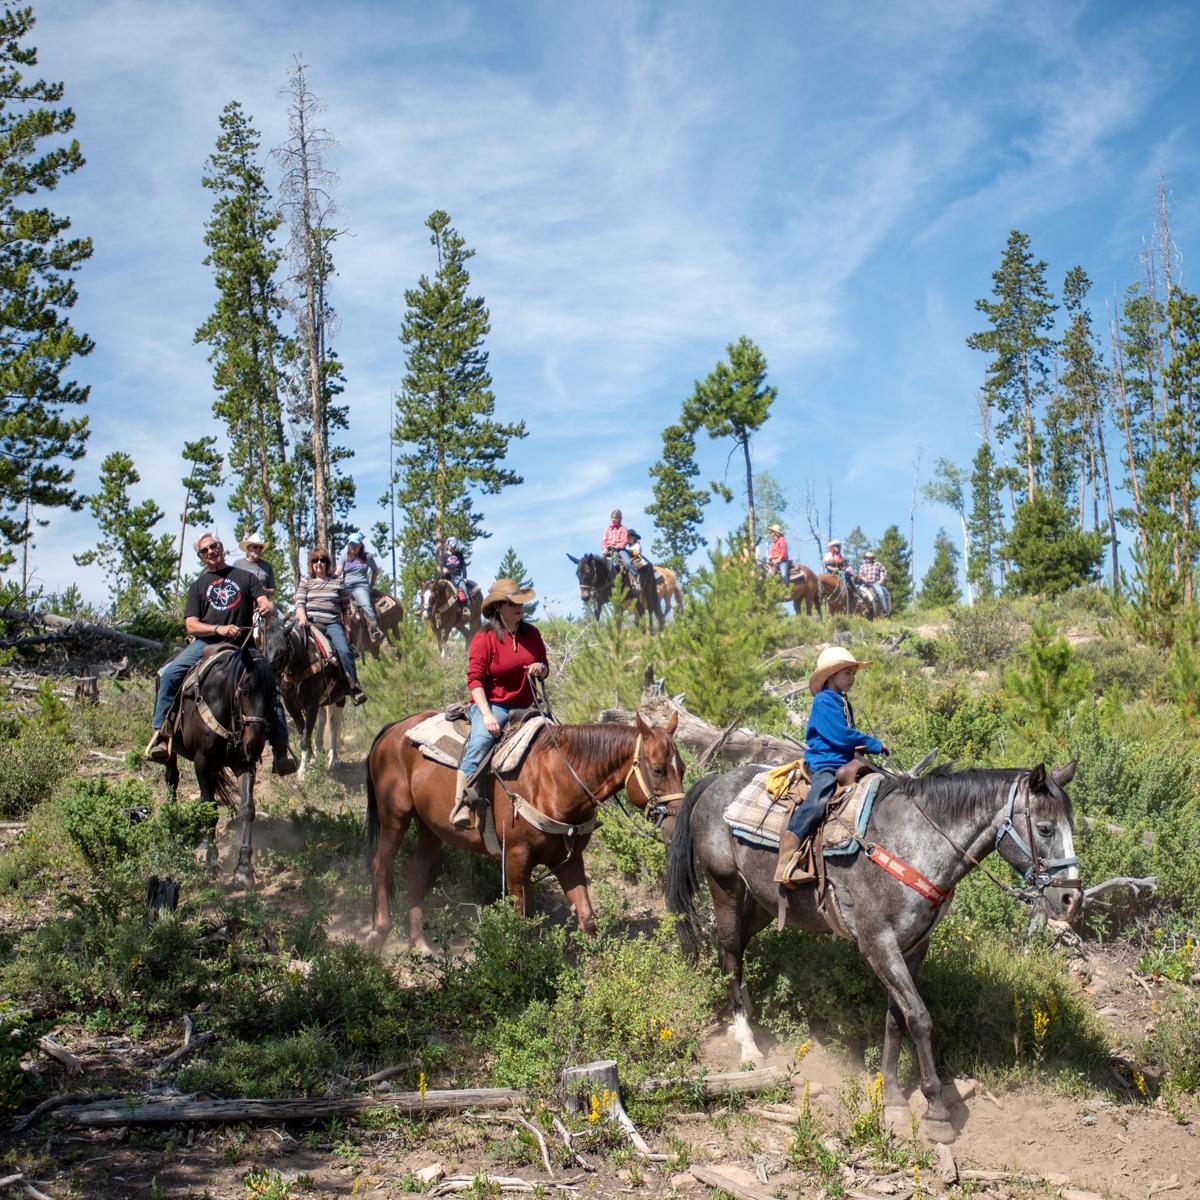 Horses on trail